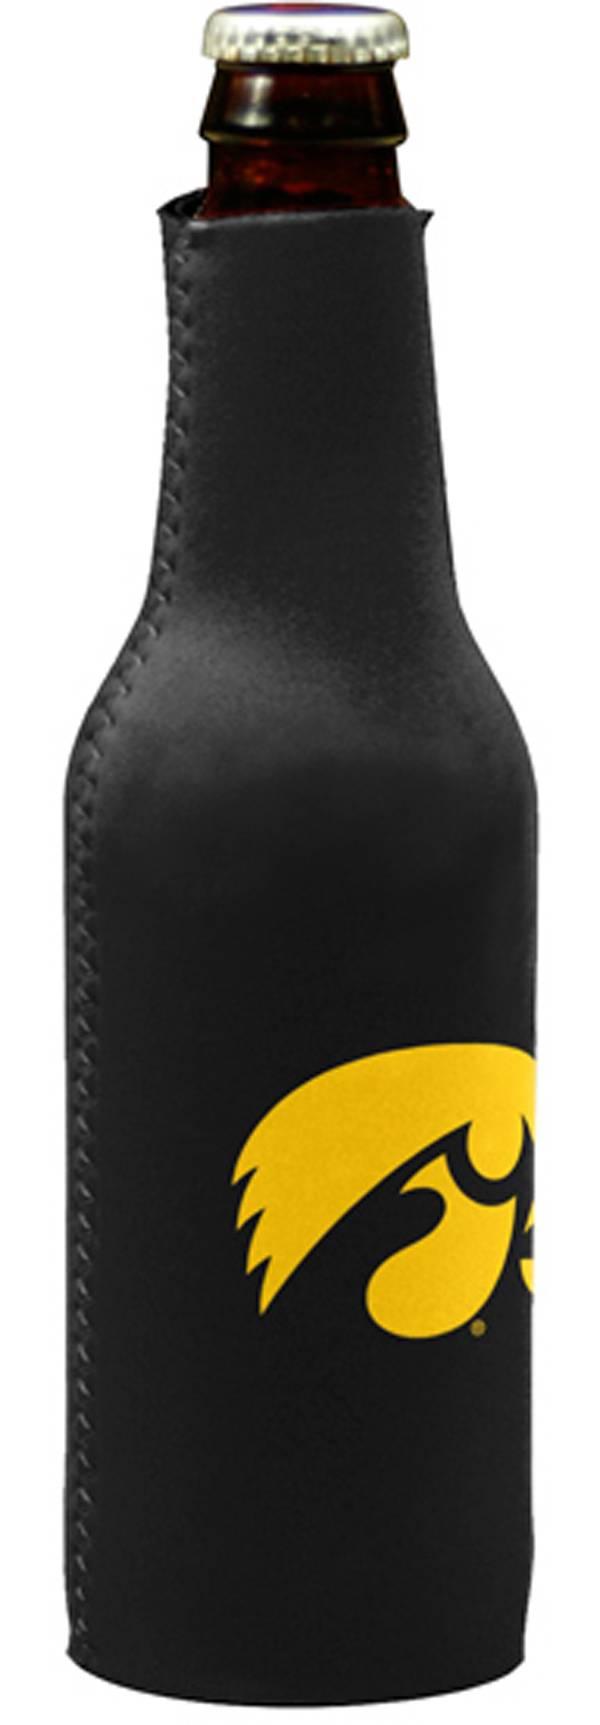 Iowa Hawkeyes Bottle Koozie product image